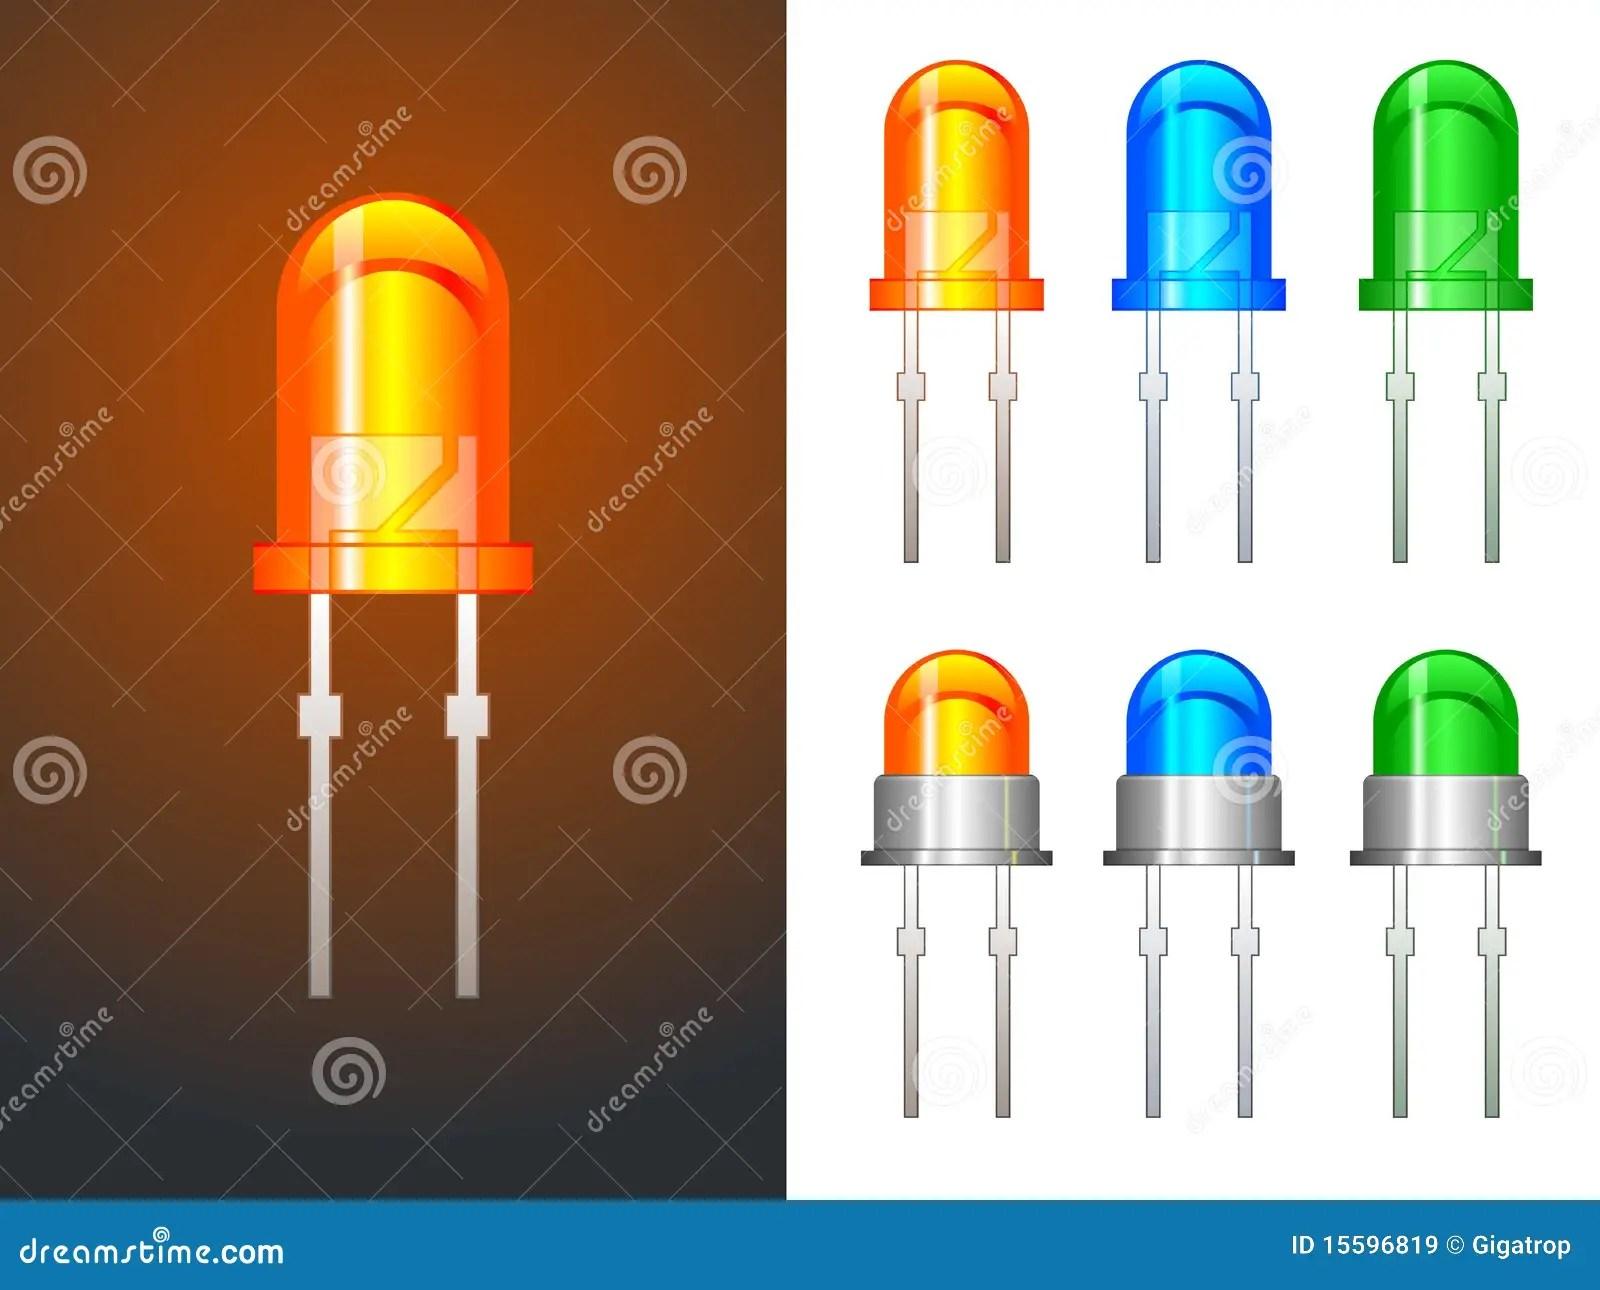 Compact Fluorescent Light Bulbs Diagram Energysavinglightbulbdiagram